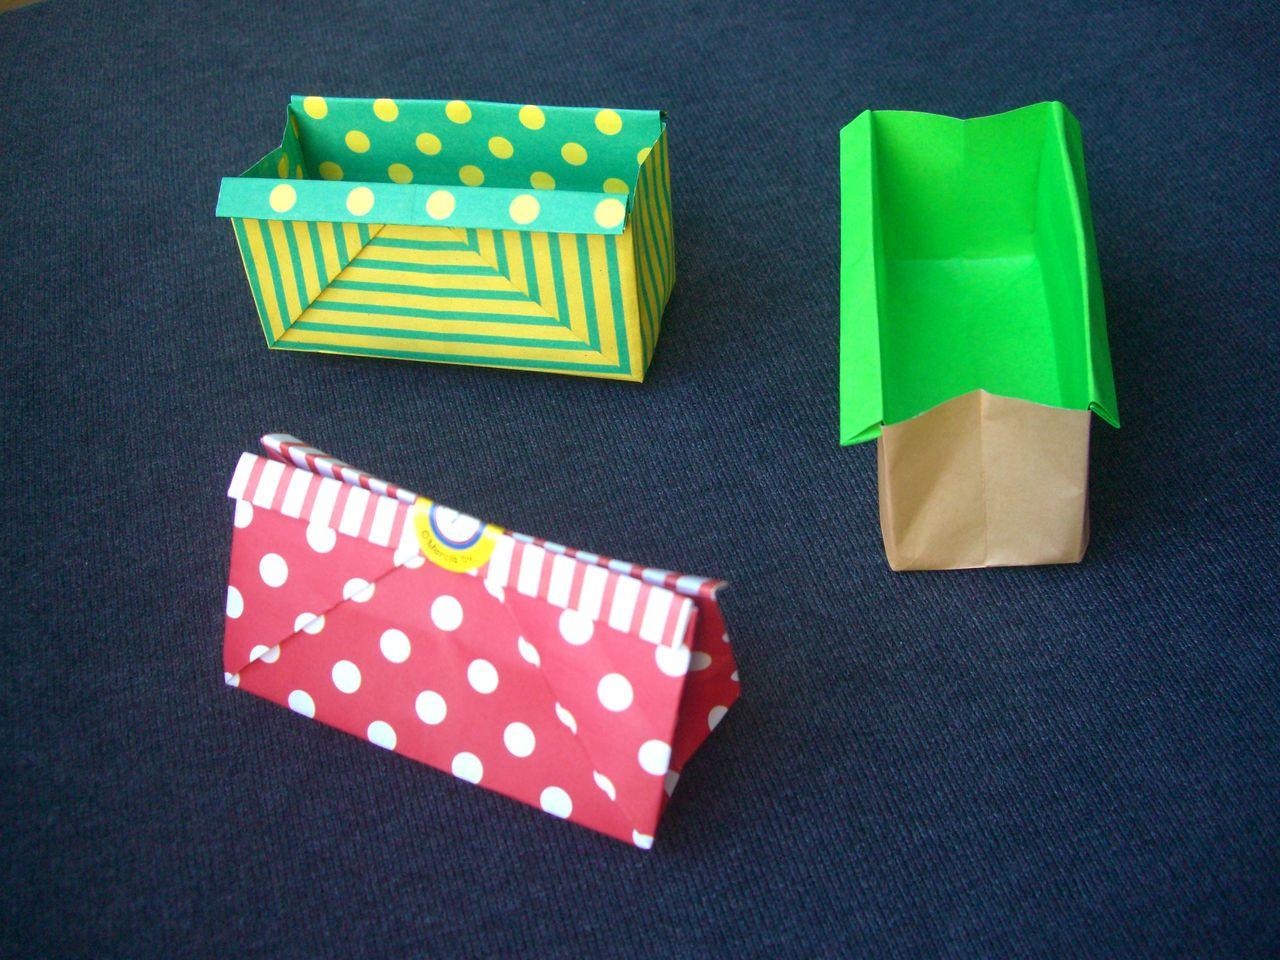 ebisuchachaのブログ : origami おりがみ遊び(長方形の箱) : 長方形 箱 : すべての講義